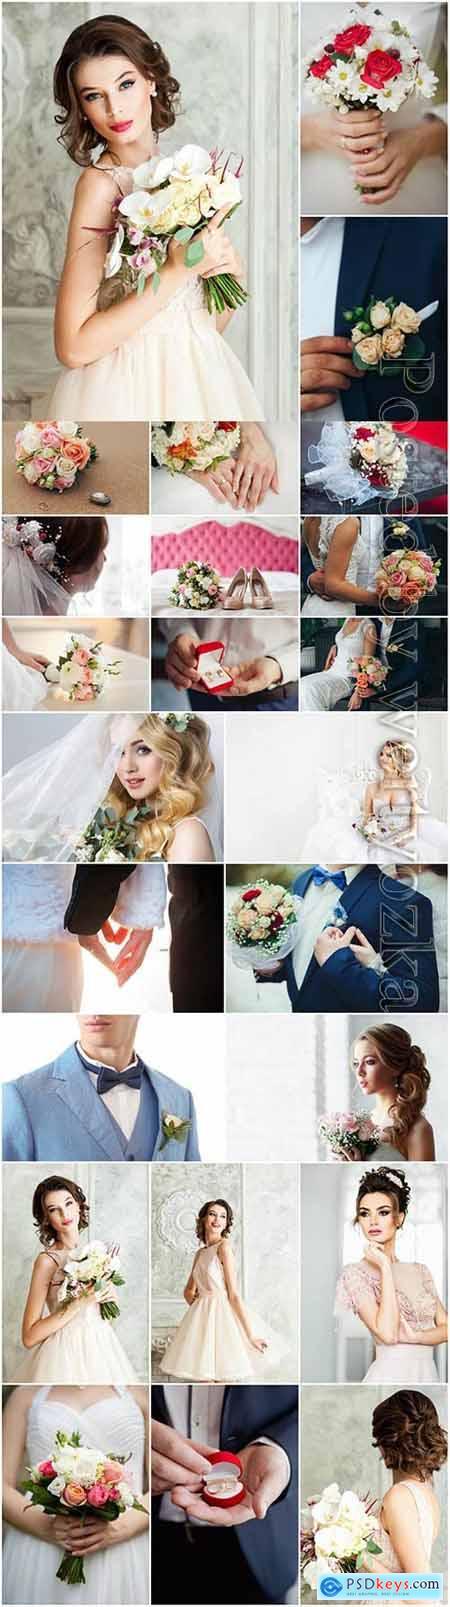 Wedding photo, bride and groom stock photo